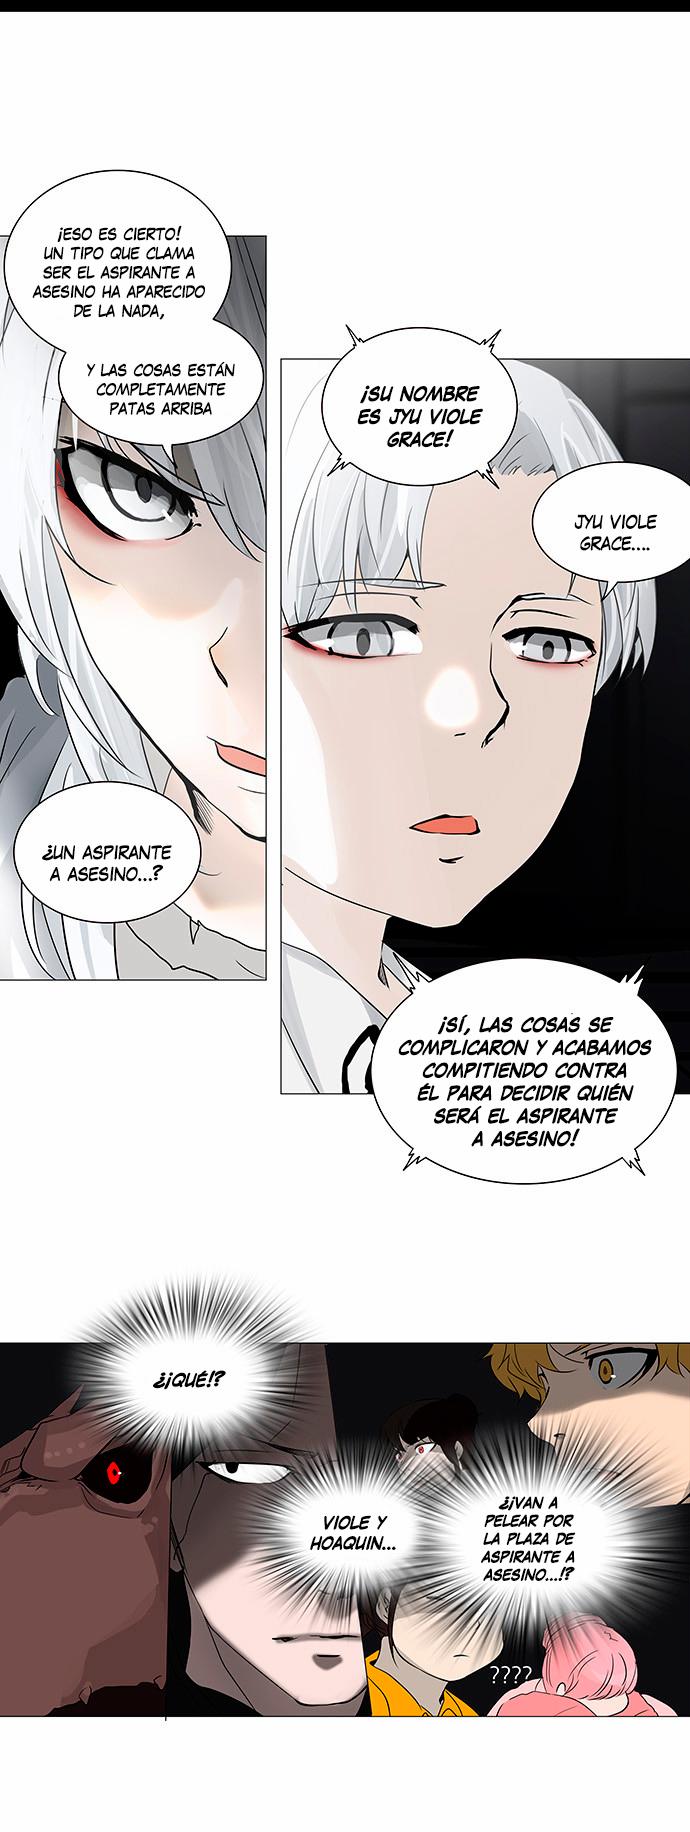 http://c5.ninemanga.com/es_manga/21/149/416884/b47b84be1e32ada197b34168a7c88052.jpg Page 4